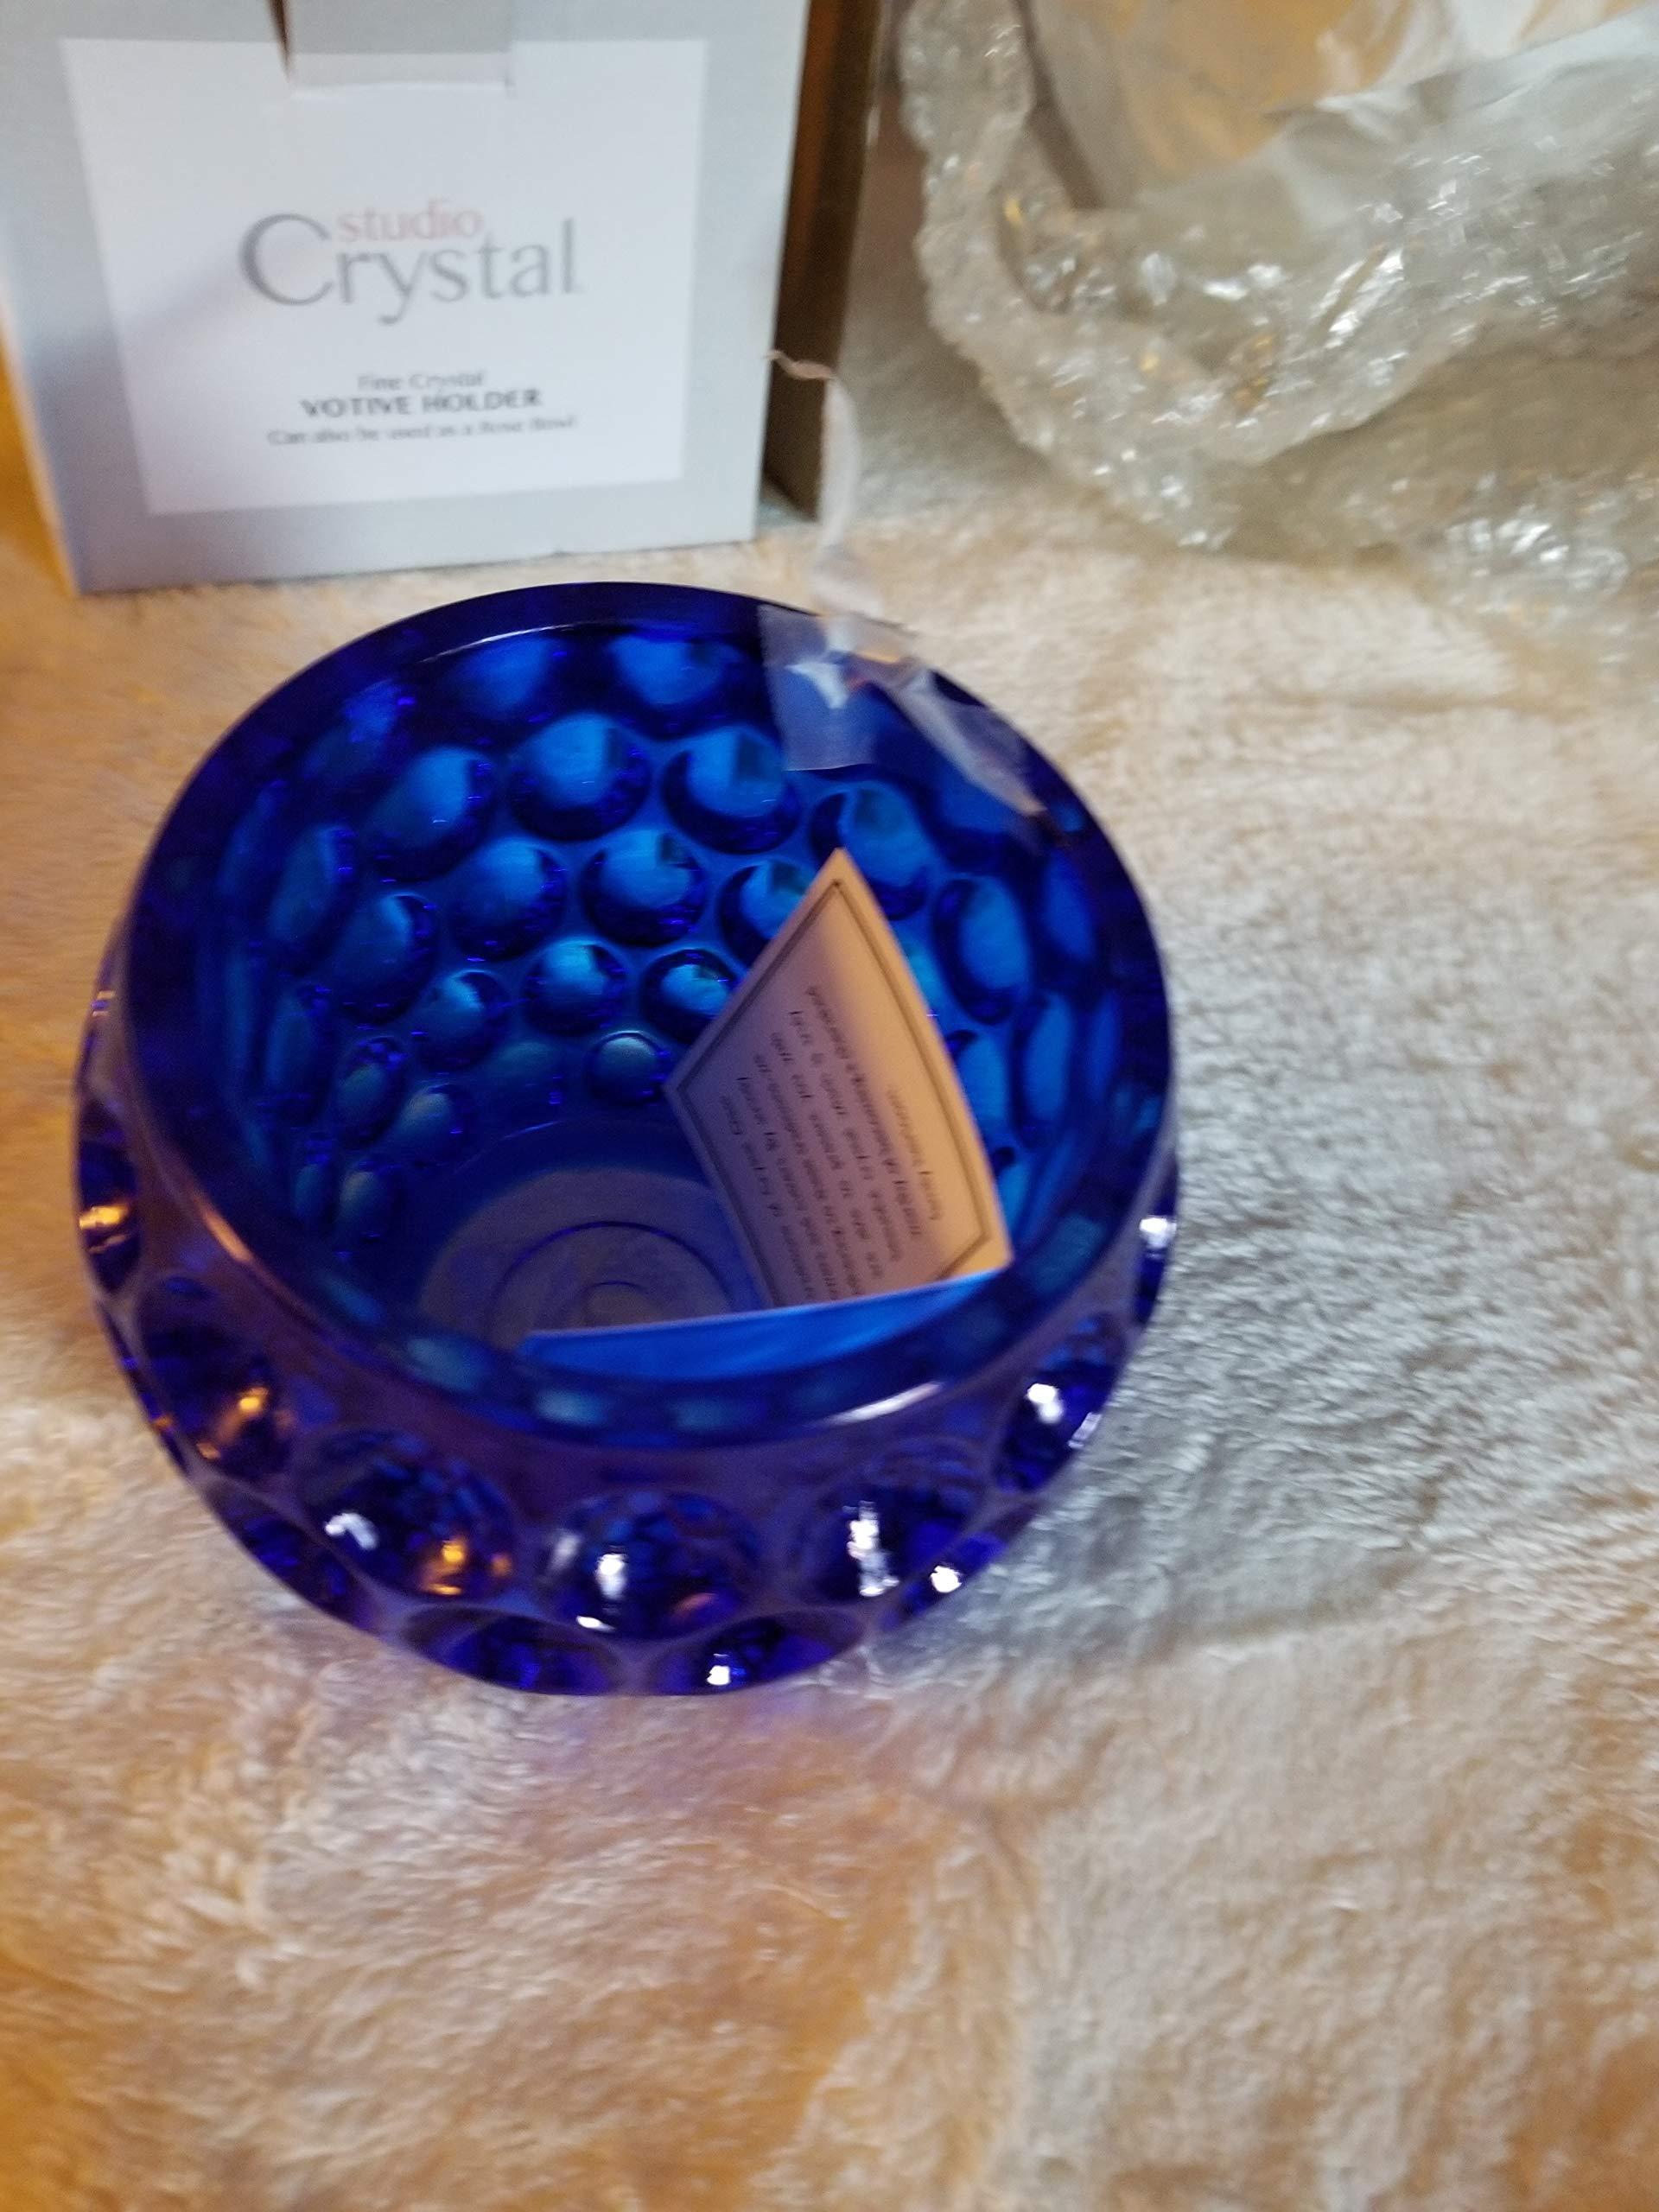 StudioSilversmiths 44276 Circle Design Votive Bowl - Blue by StudioSilversmiths